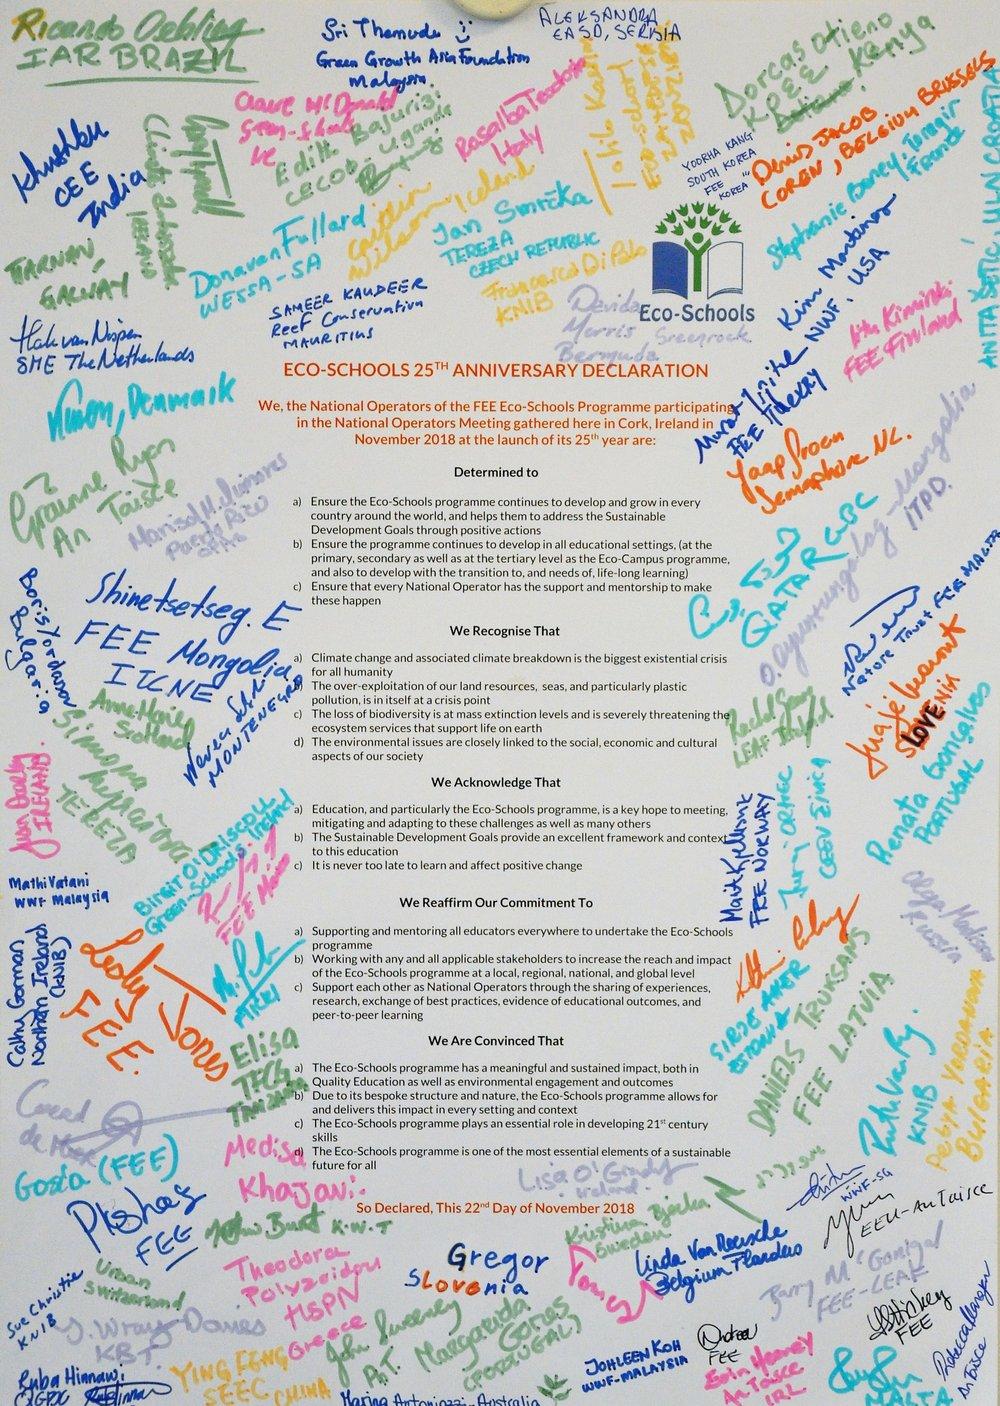 Eco-Schools 25 Anniversary Declaration.jpg